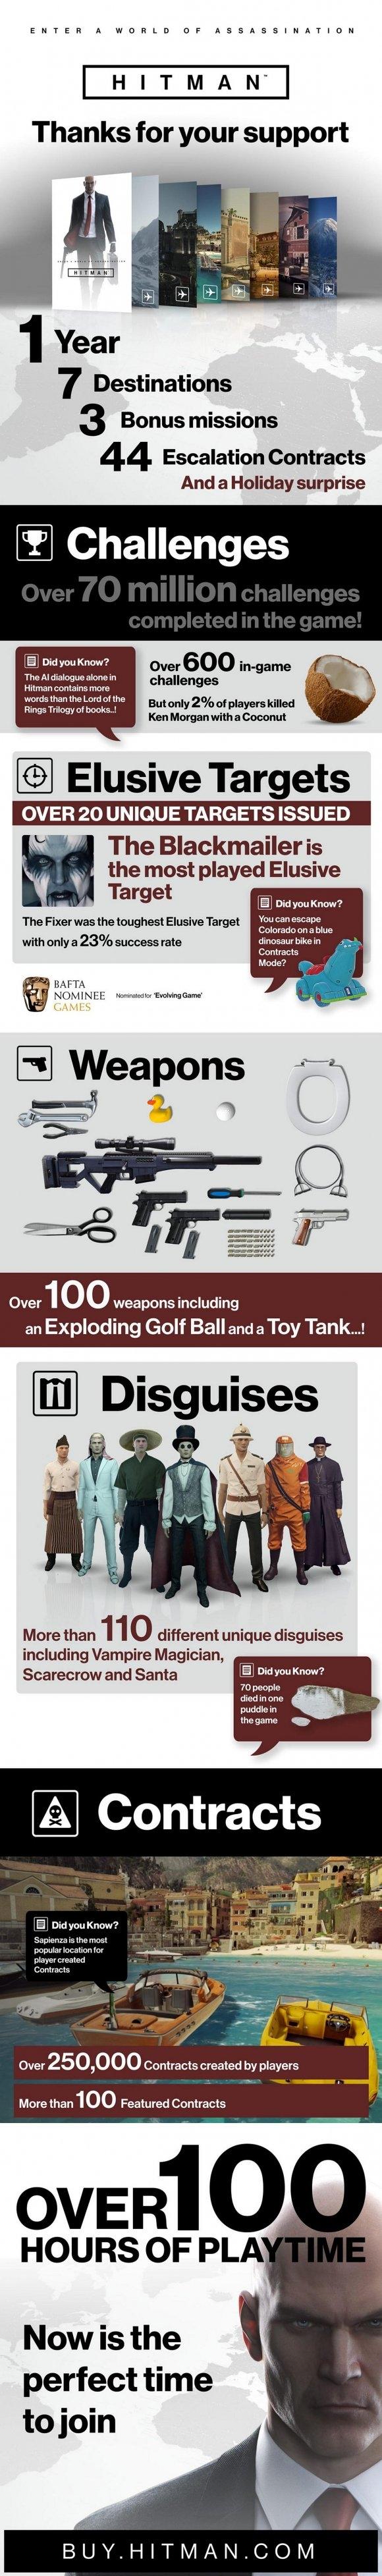 Hitman Year One Infographic